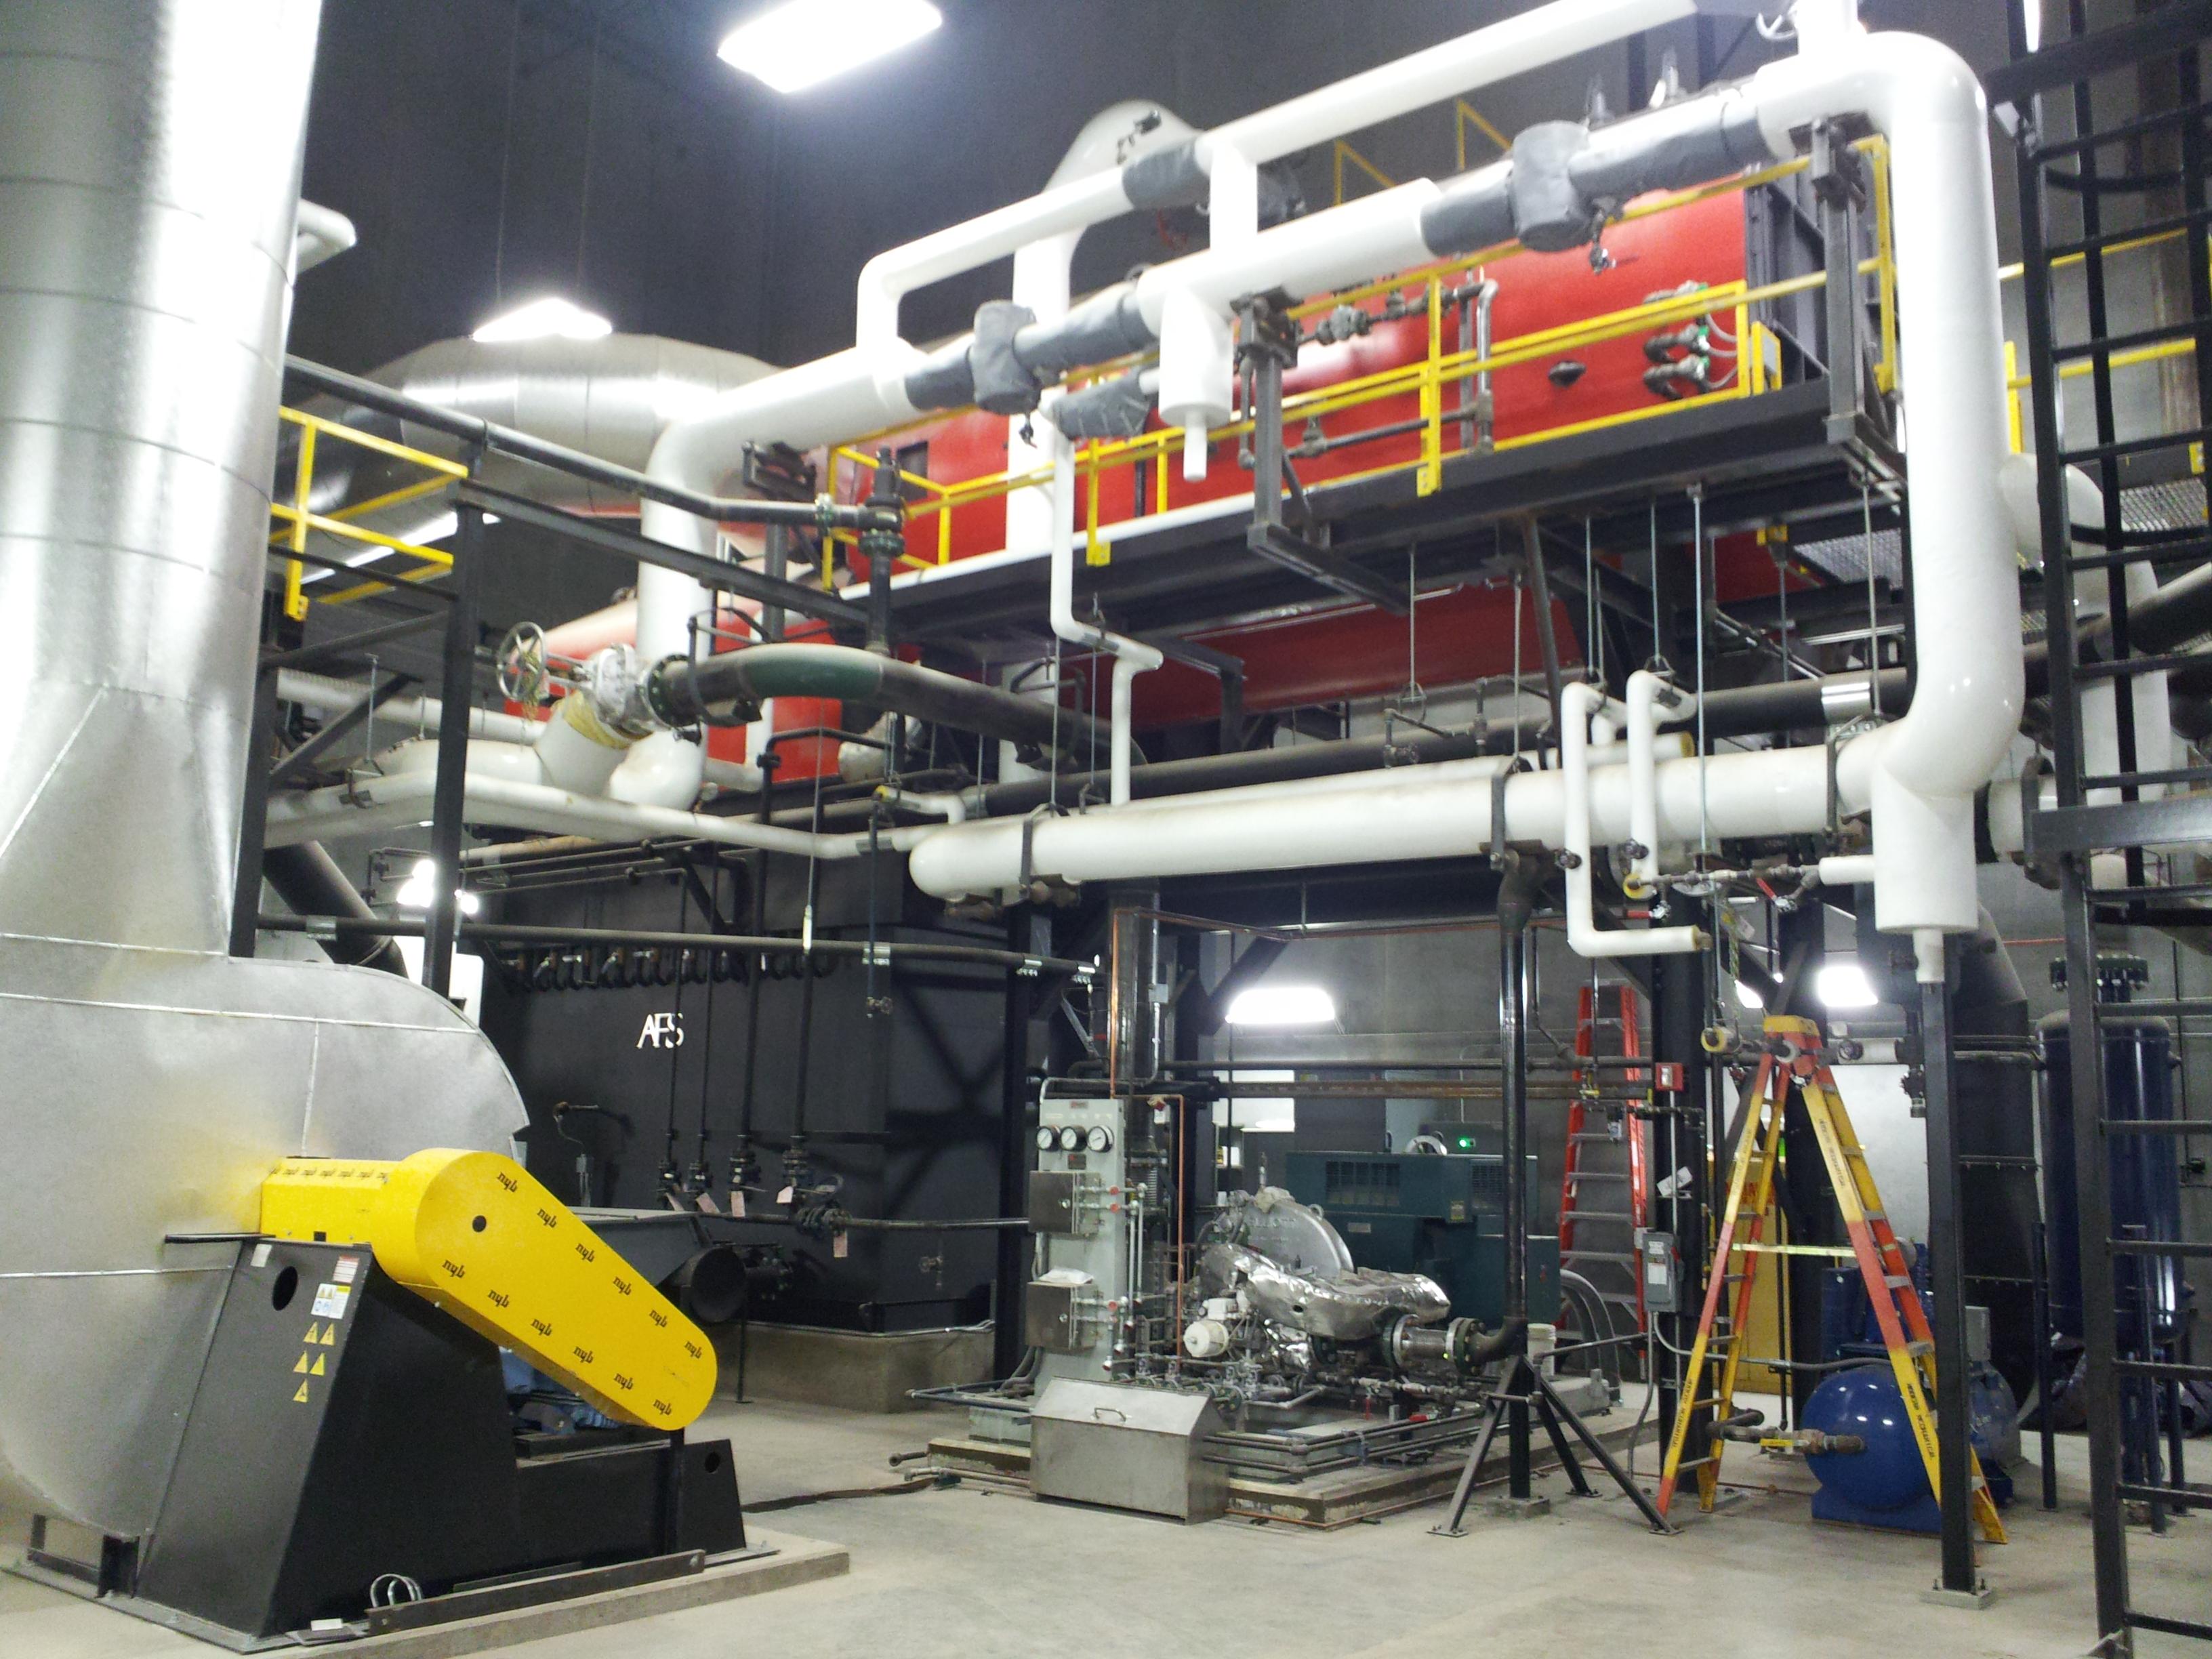 Gundersen Lutheran Biomass Cogeneration